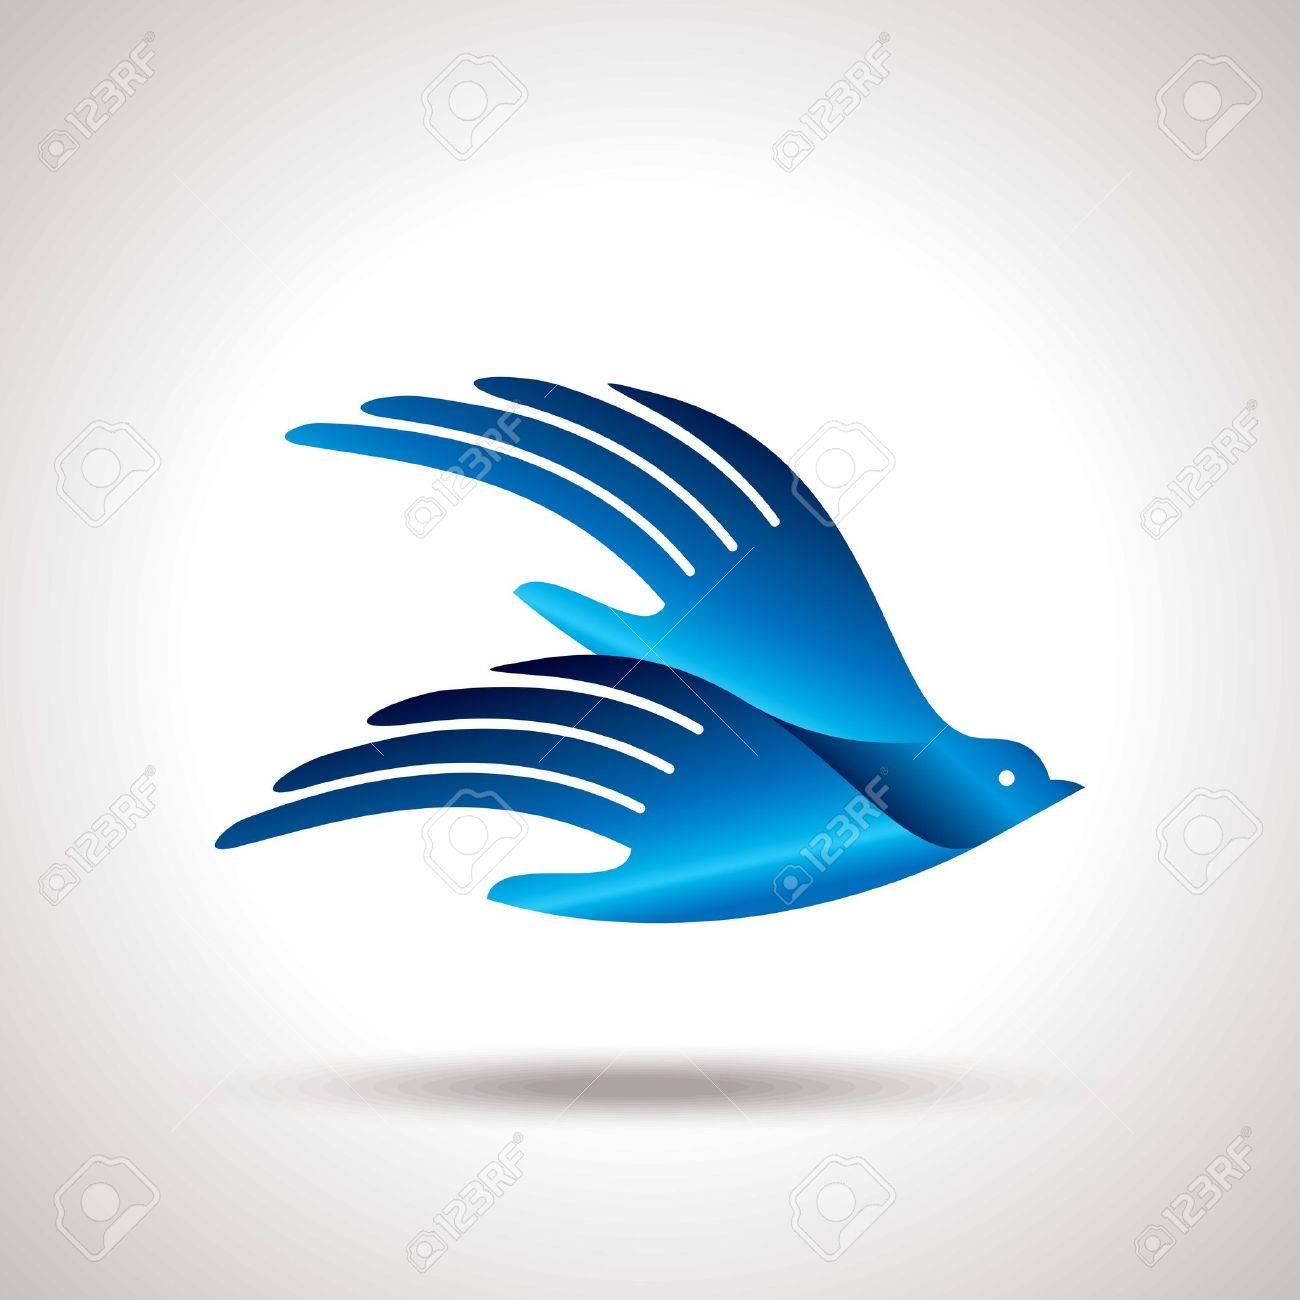 fly of bird to hand  creative idea Stock Vector - 20881395